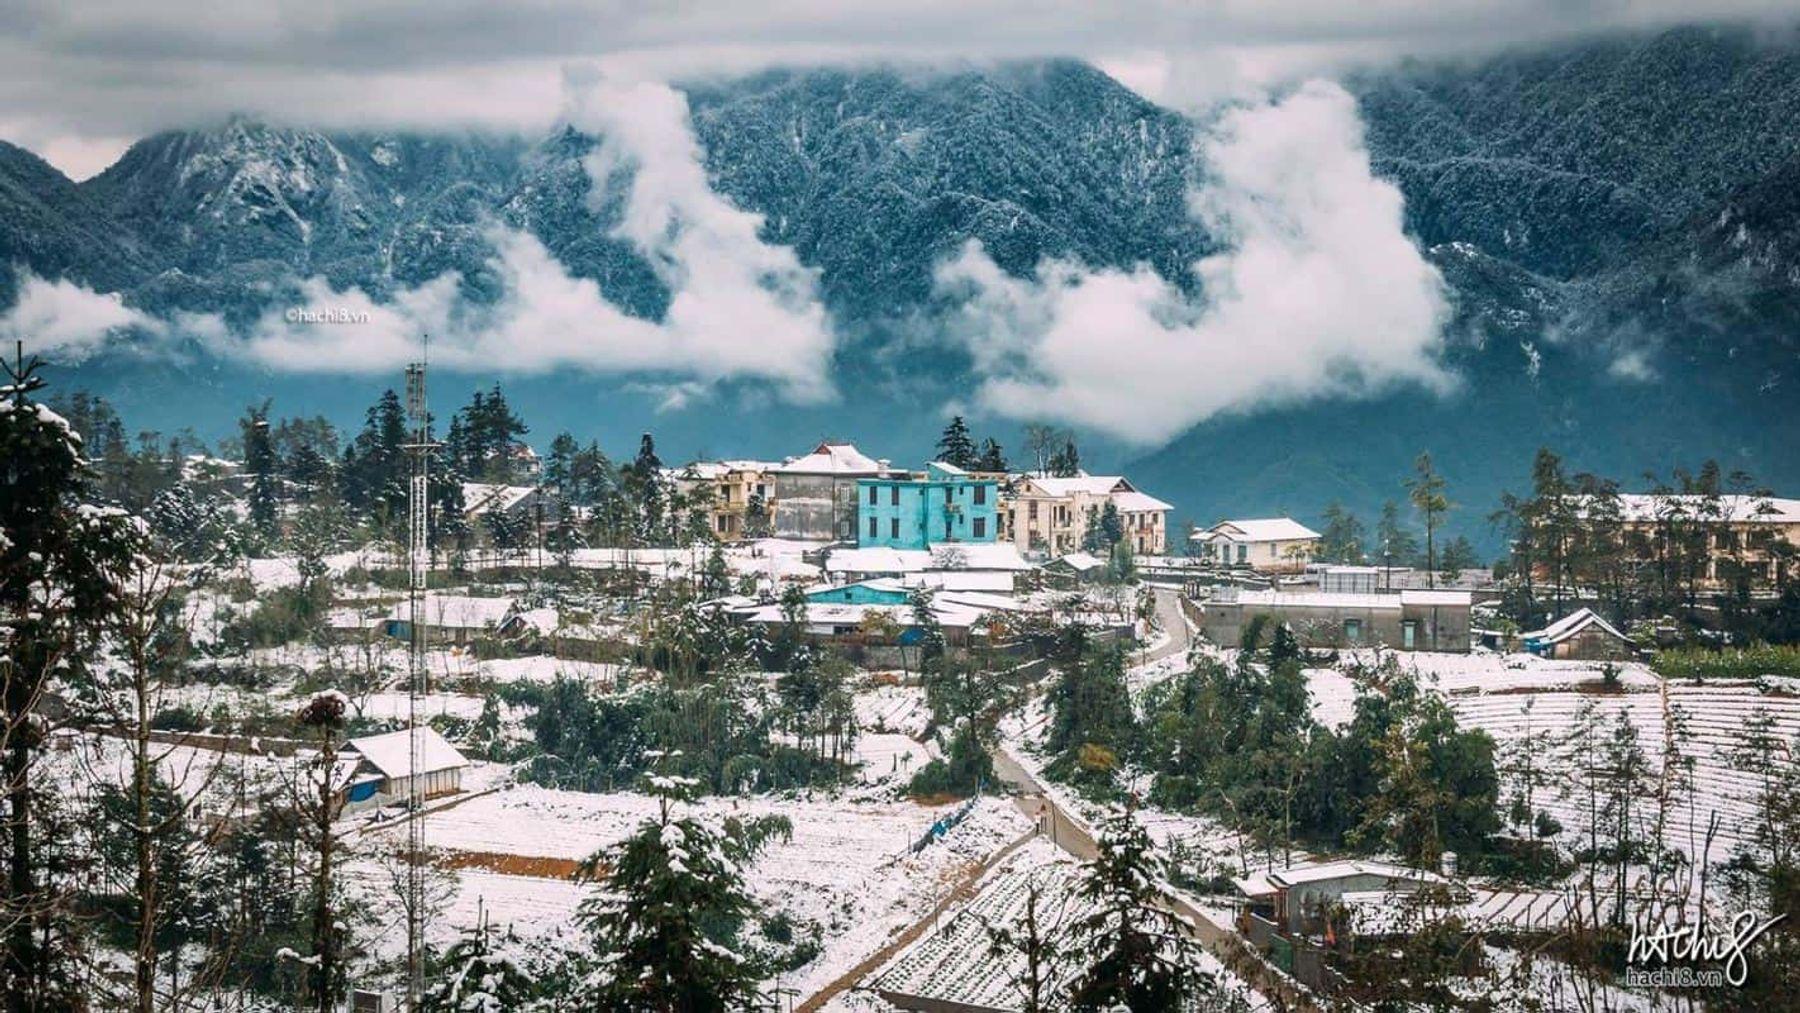 Du lịch Sapa mùa tuyết